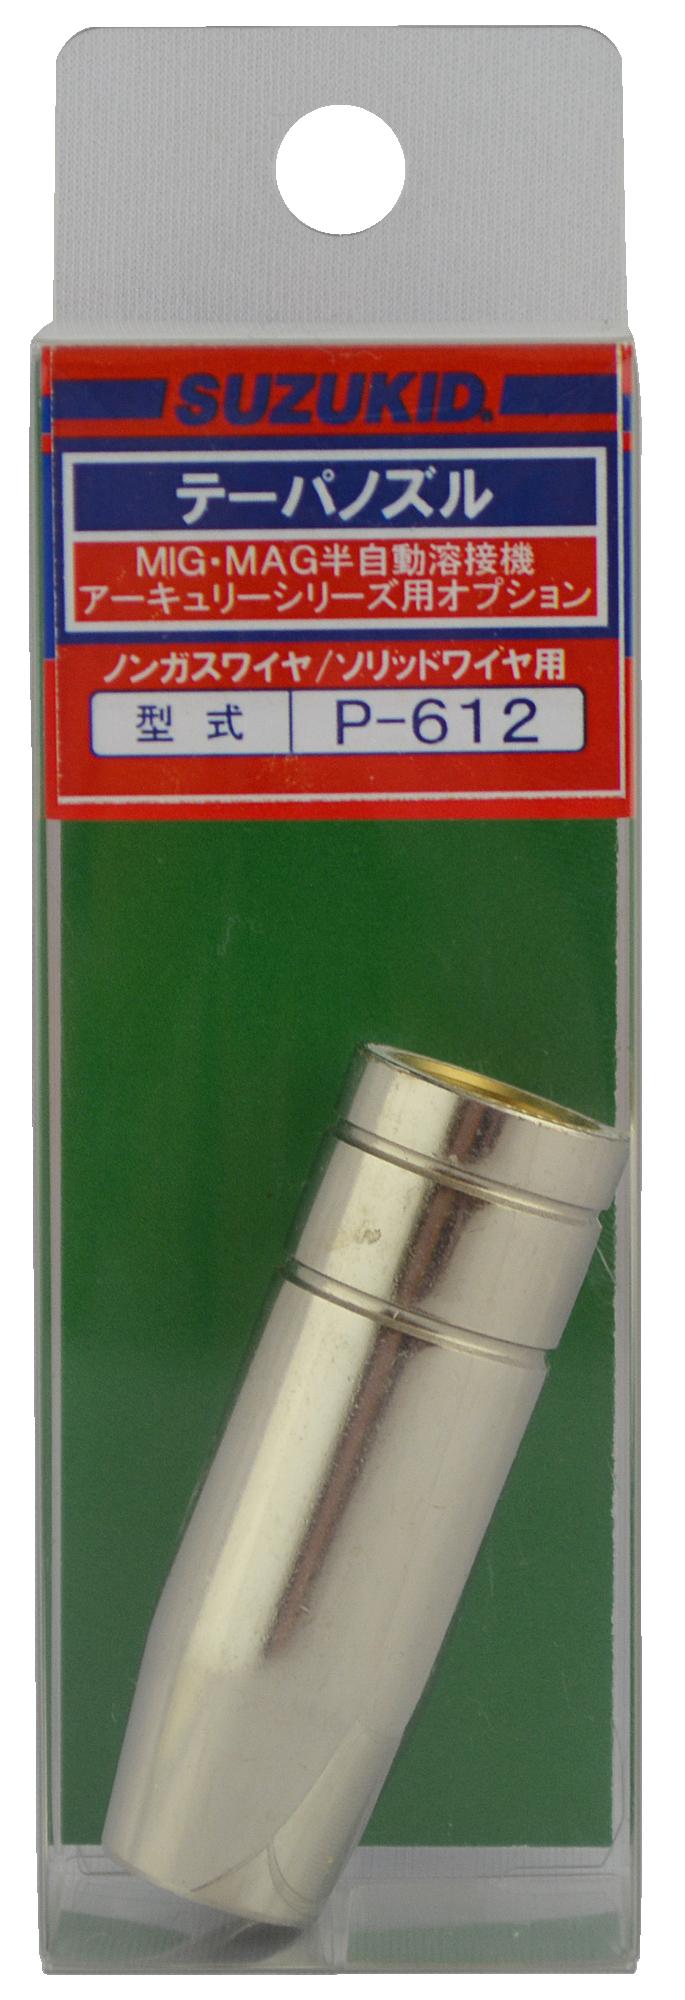 P-612